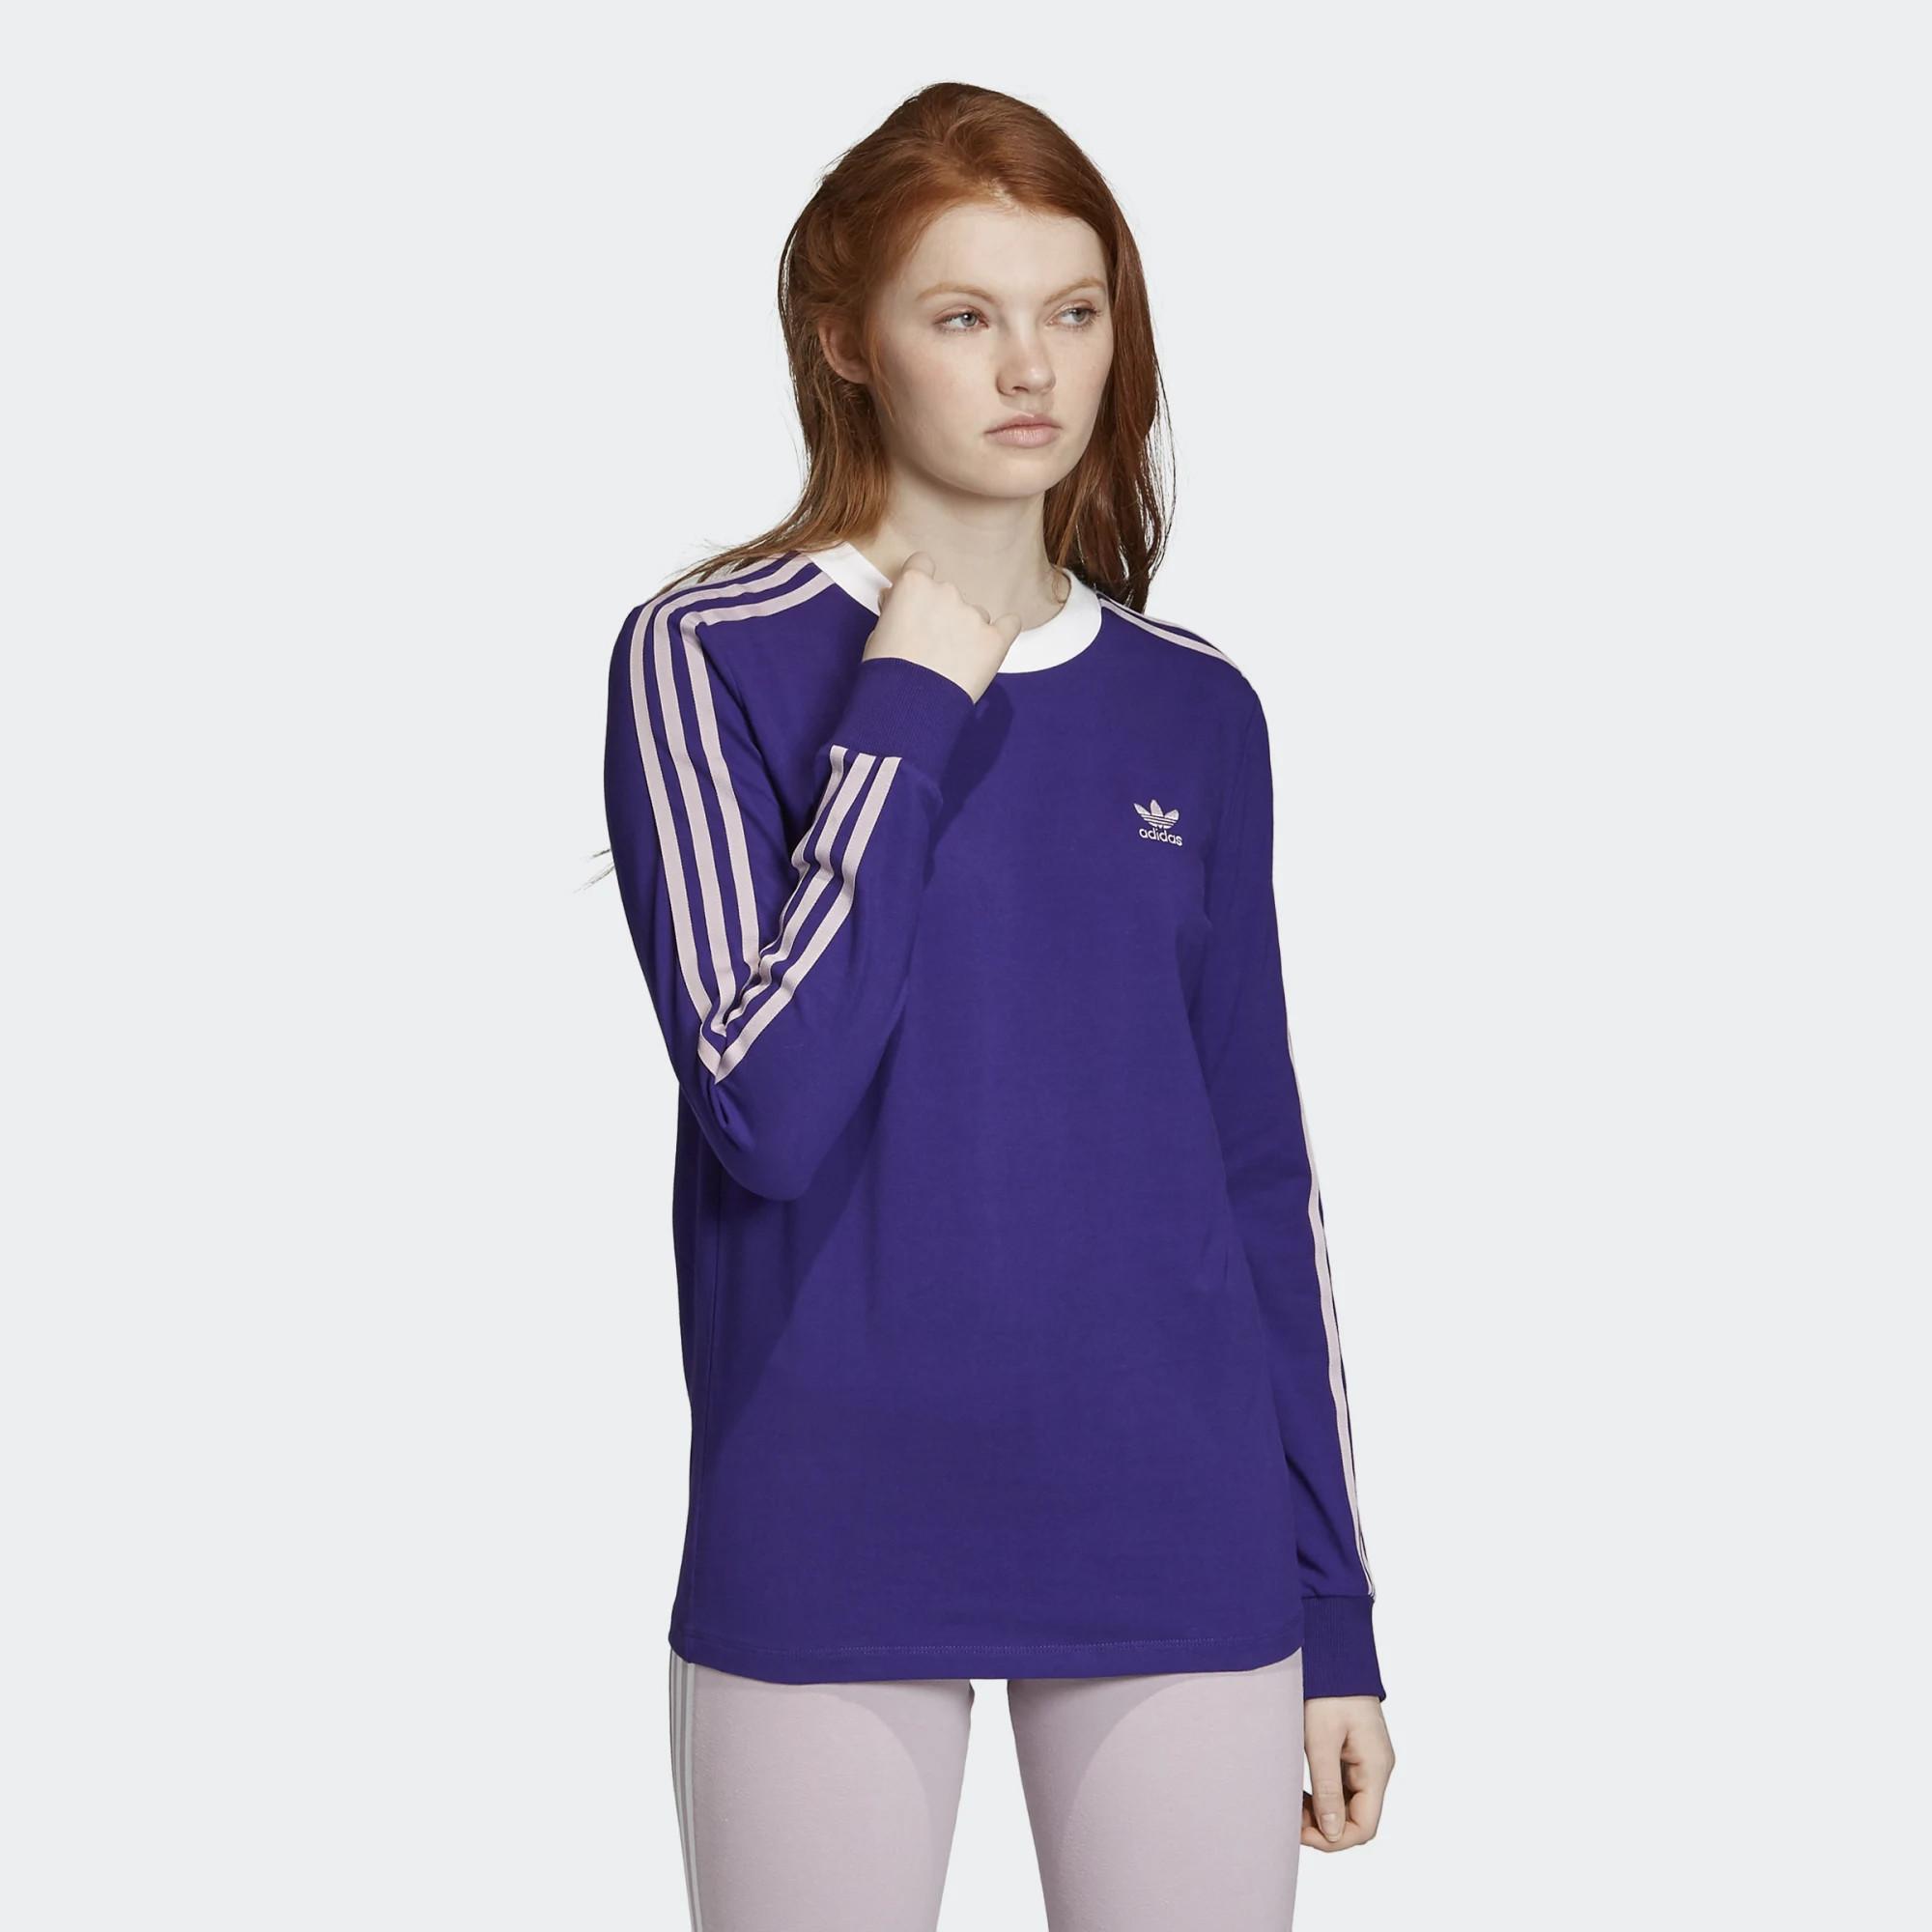 adidas Originals 3 Stripes Women's Tee (9000032678_39897)